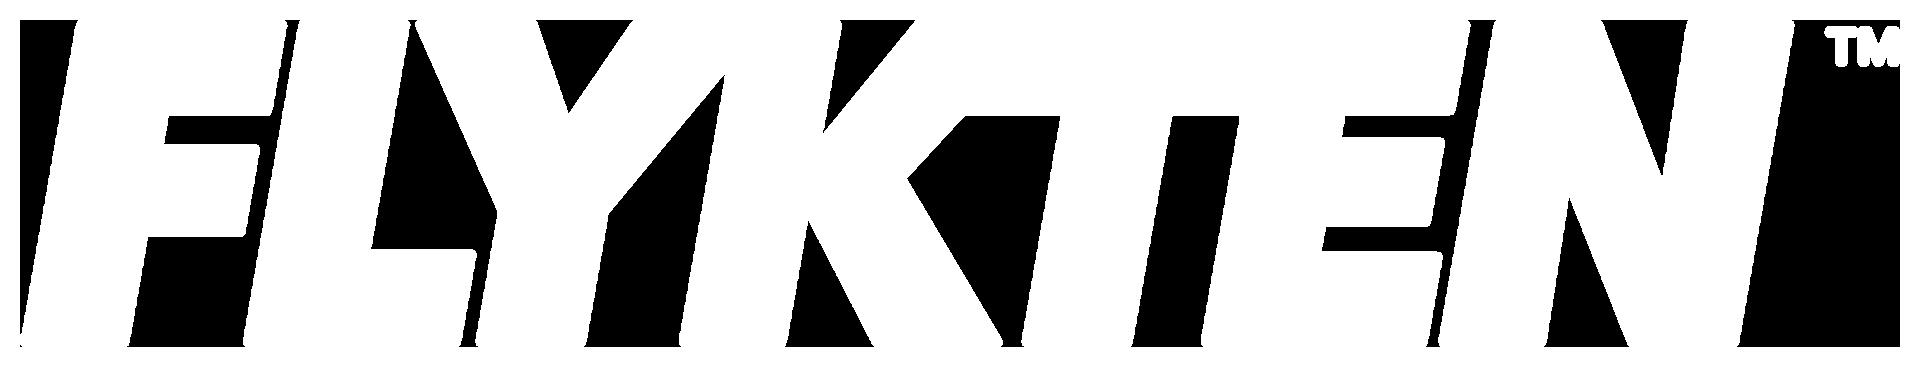 Logo_web_1920_oskarp.png